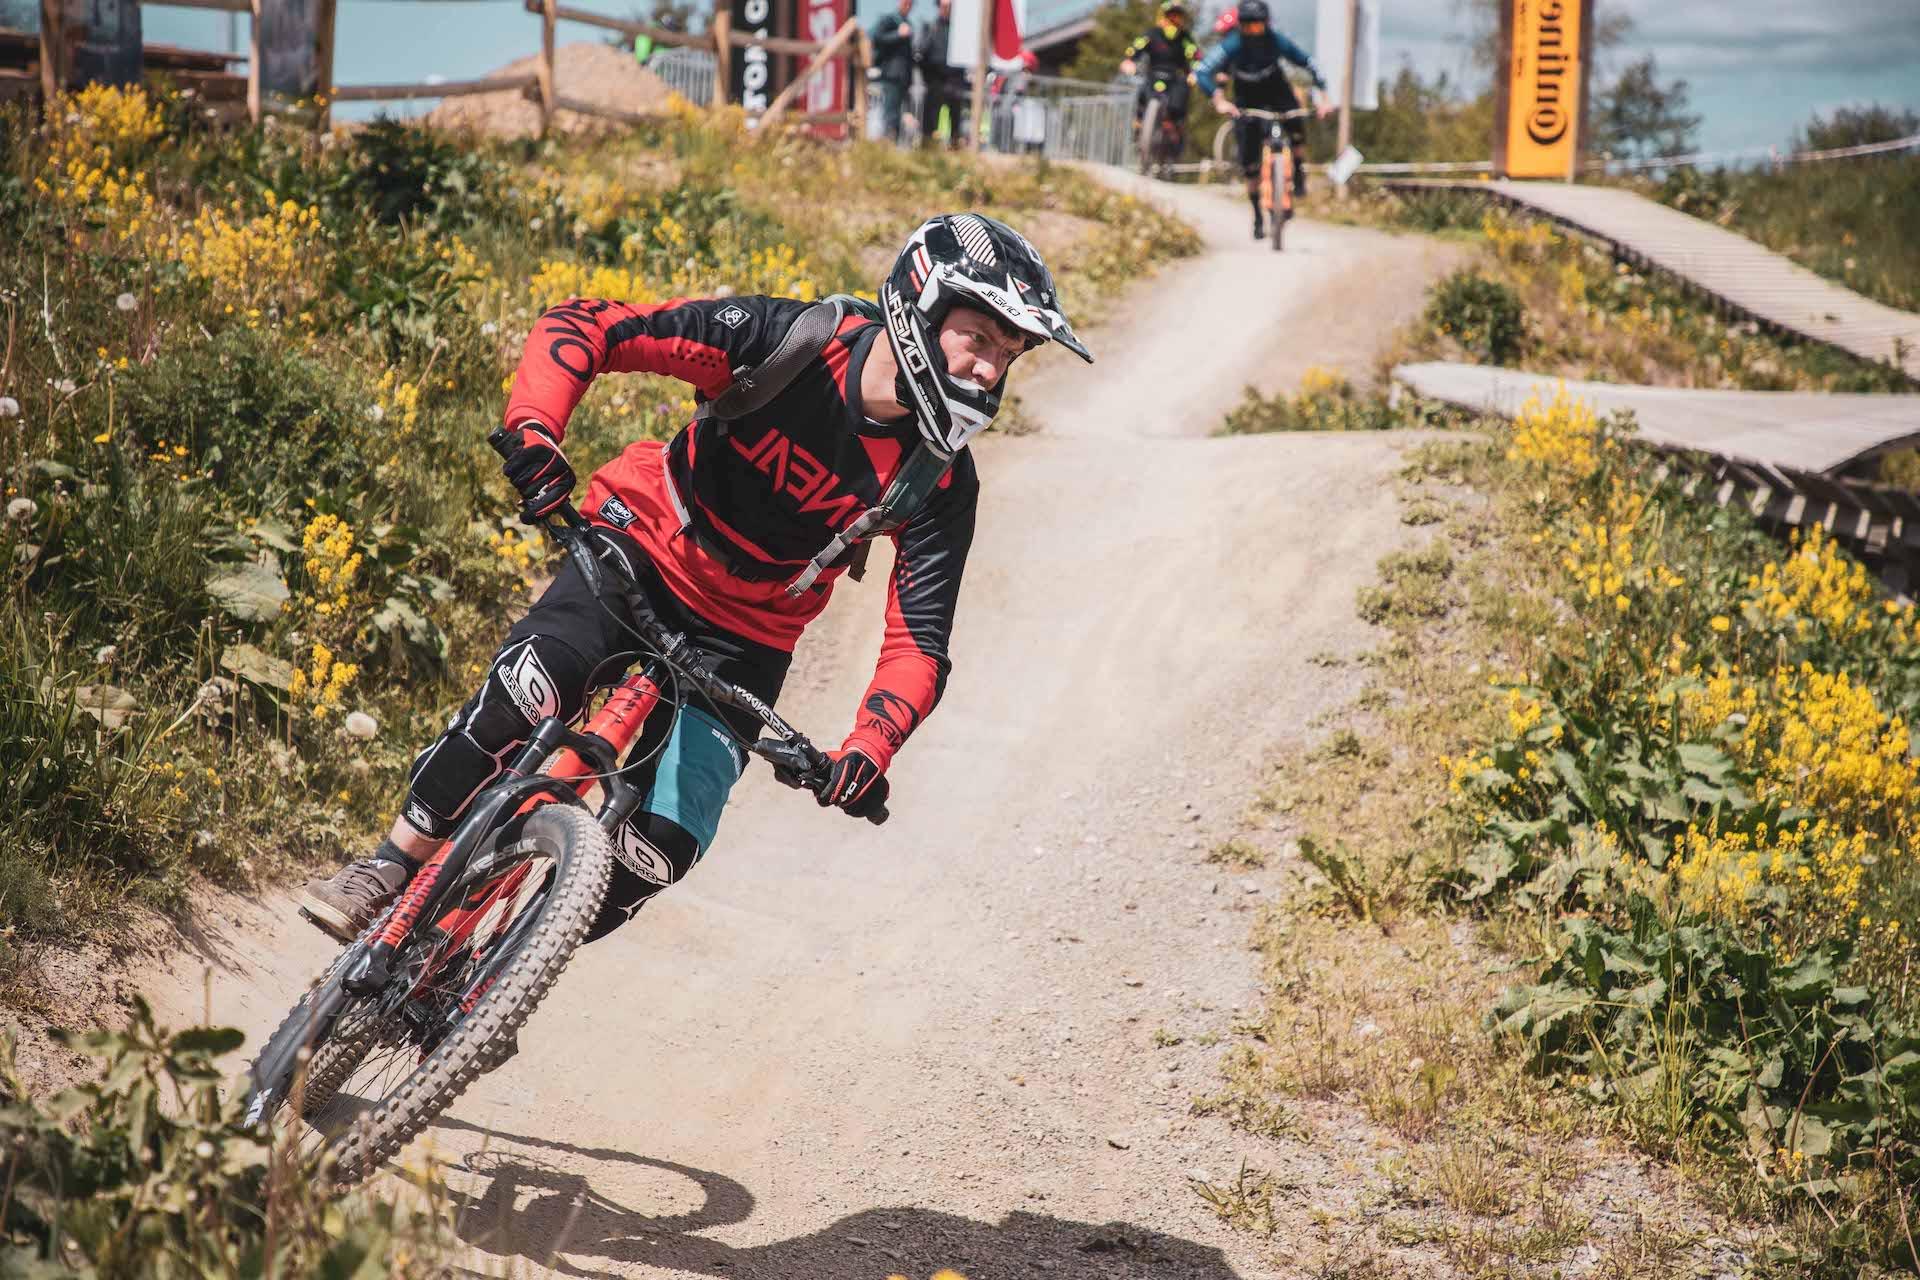 Bikepark Basics+ Fahrtechnik Kurs in Osternohe - Fahrtechnik Training Rock my Trail Bikeschule